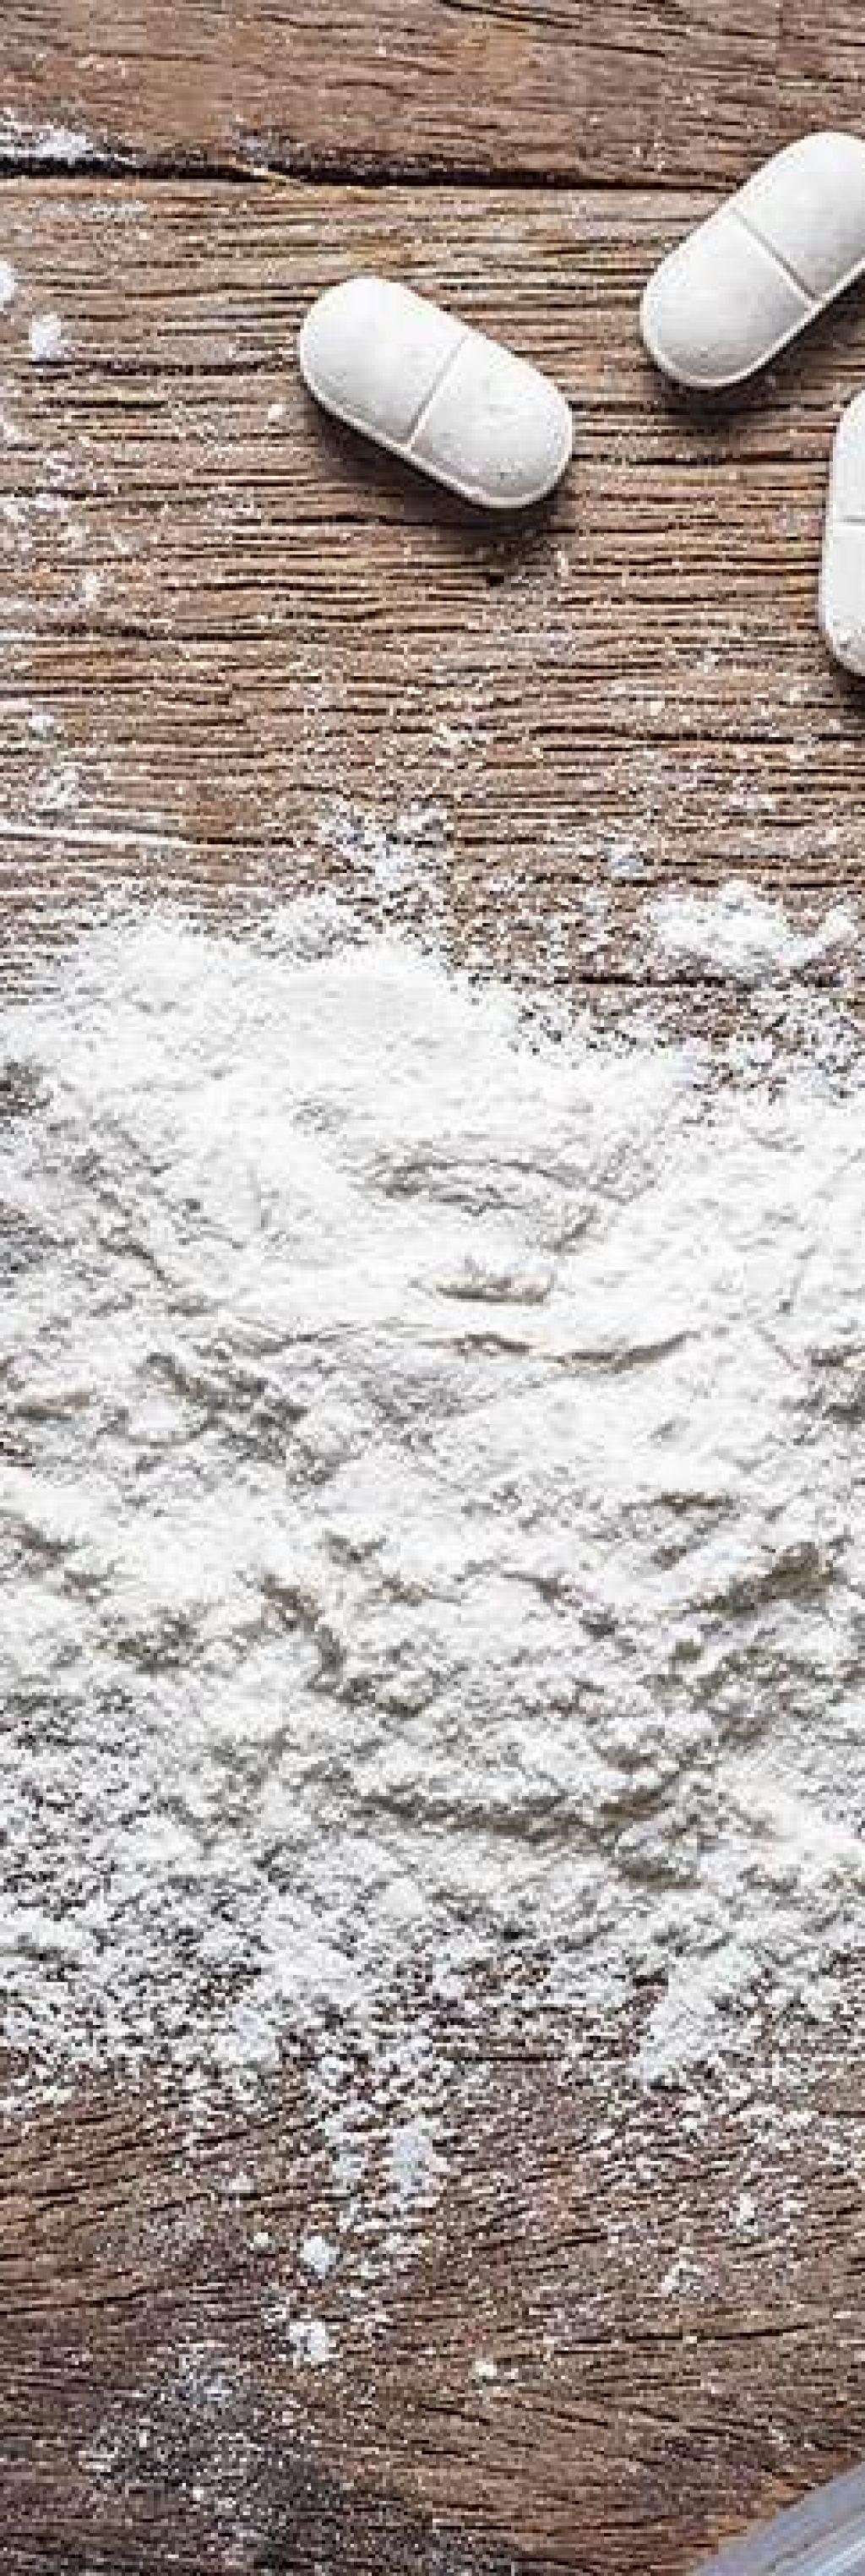 837810-drugs-1-thinkstock